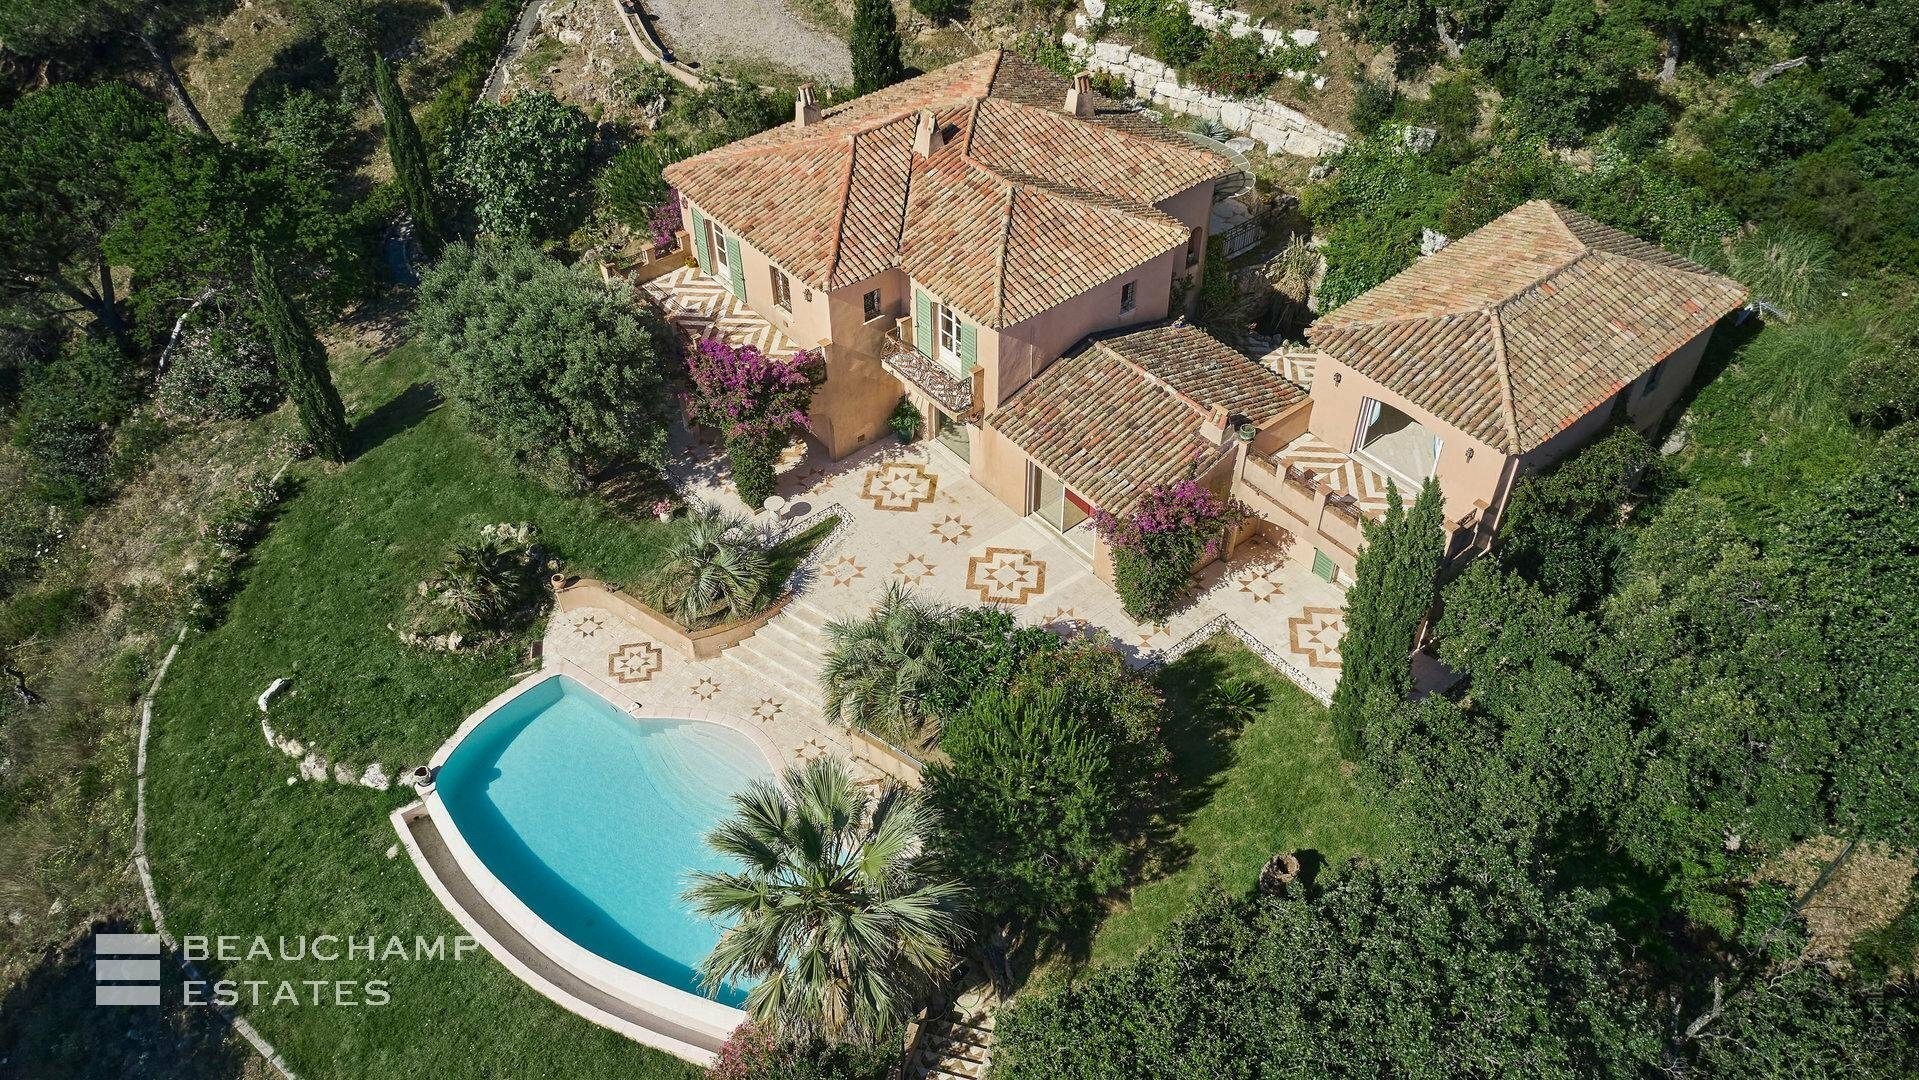 Villa in Ramatuelle, Provence-Alpes-Côte d'Azur, France 1